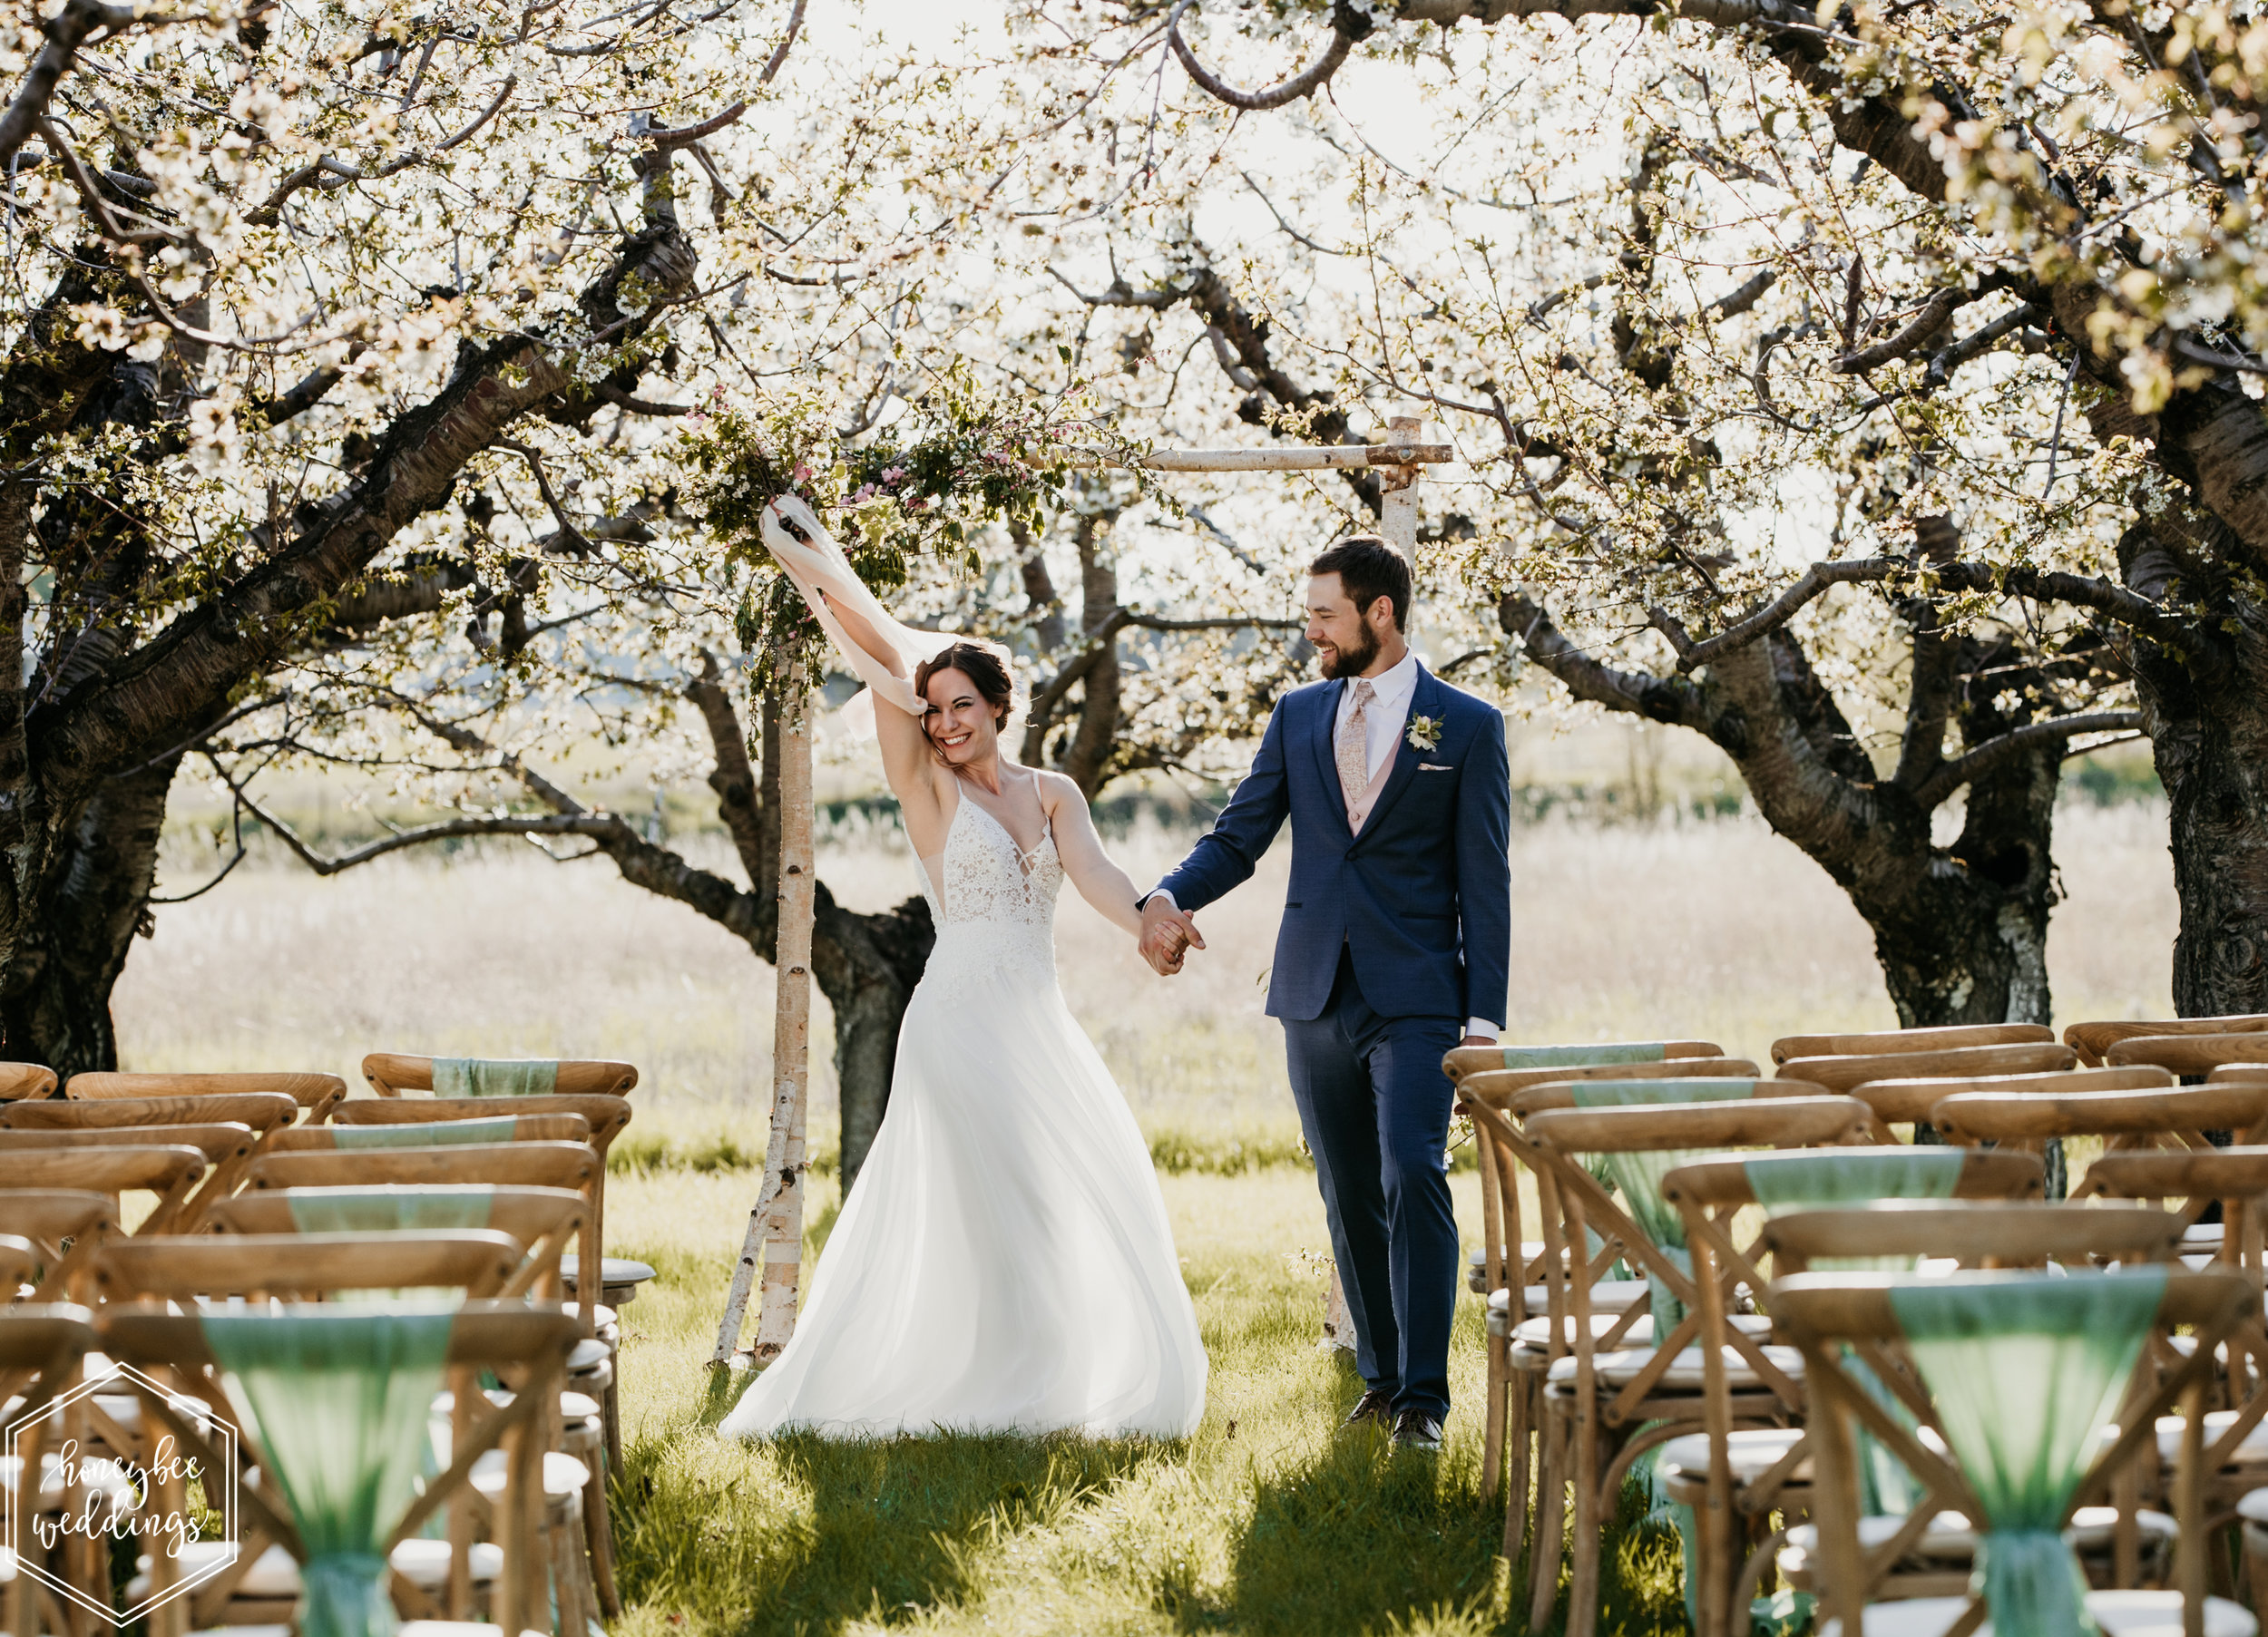 050Cherry Blossom Wedding_Styled Photoshoot_Honeybee Weddings_May 11, 2019-416.jpg